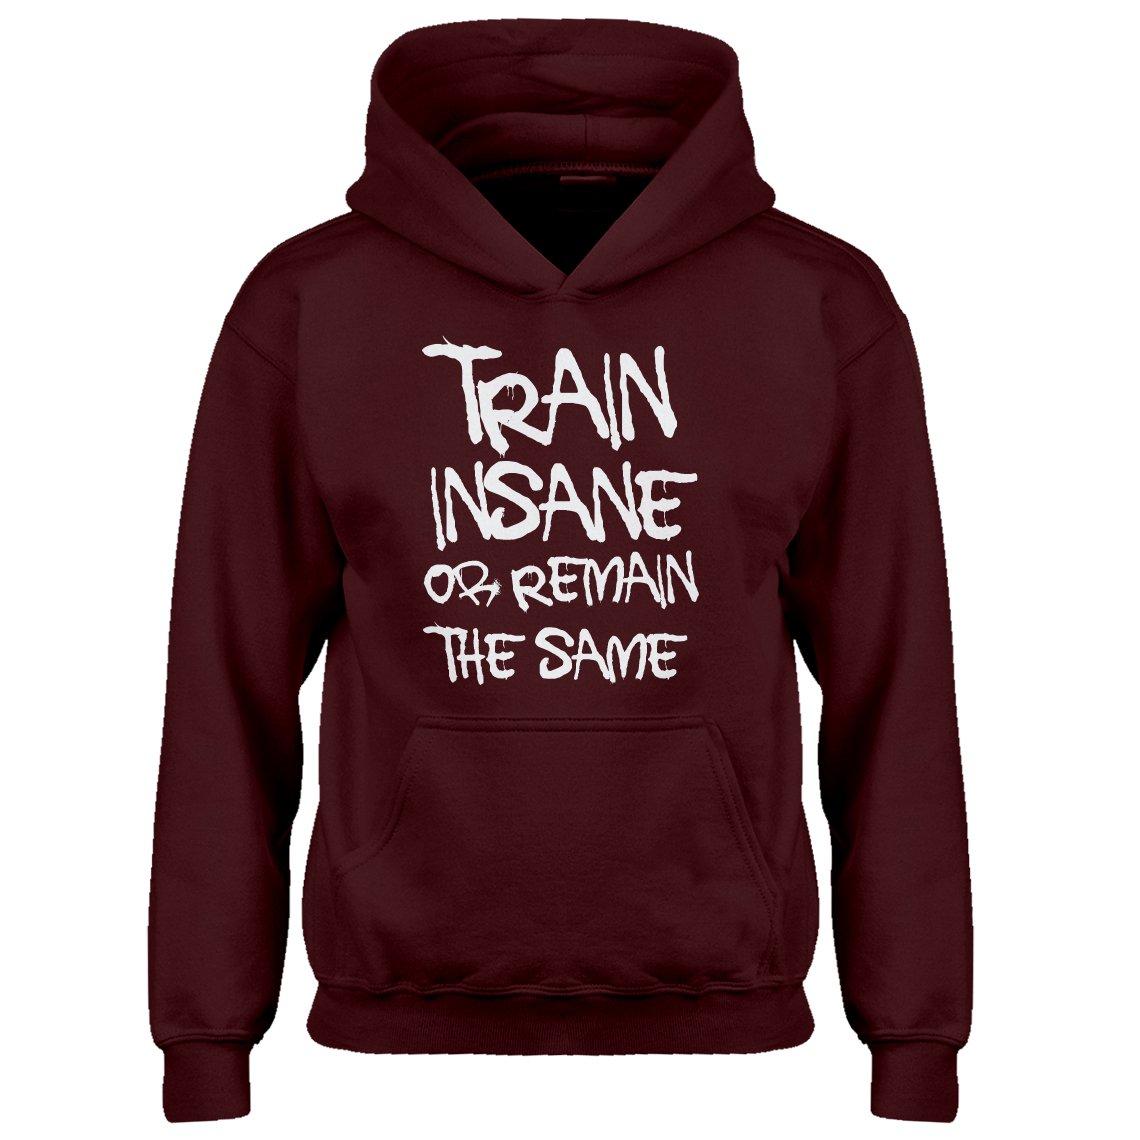 Indica Plateau Kids Hoodie Train Insane Or Remain The Same X-Small Maroon Hoodie